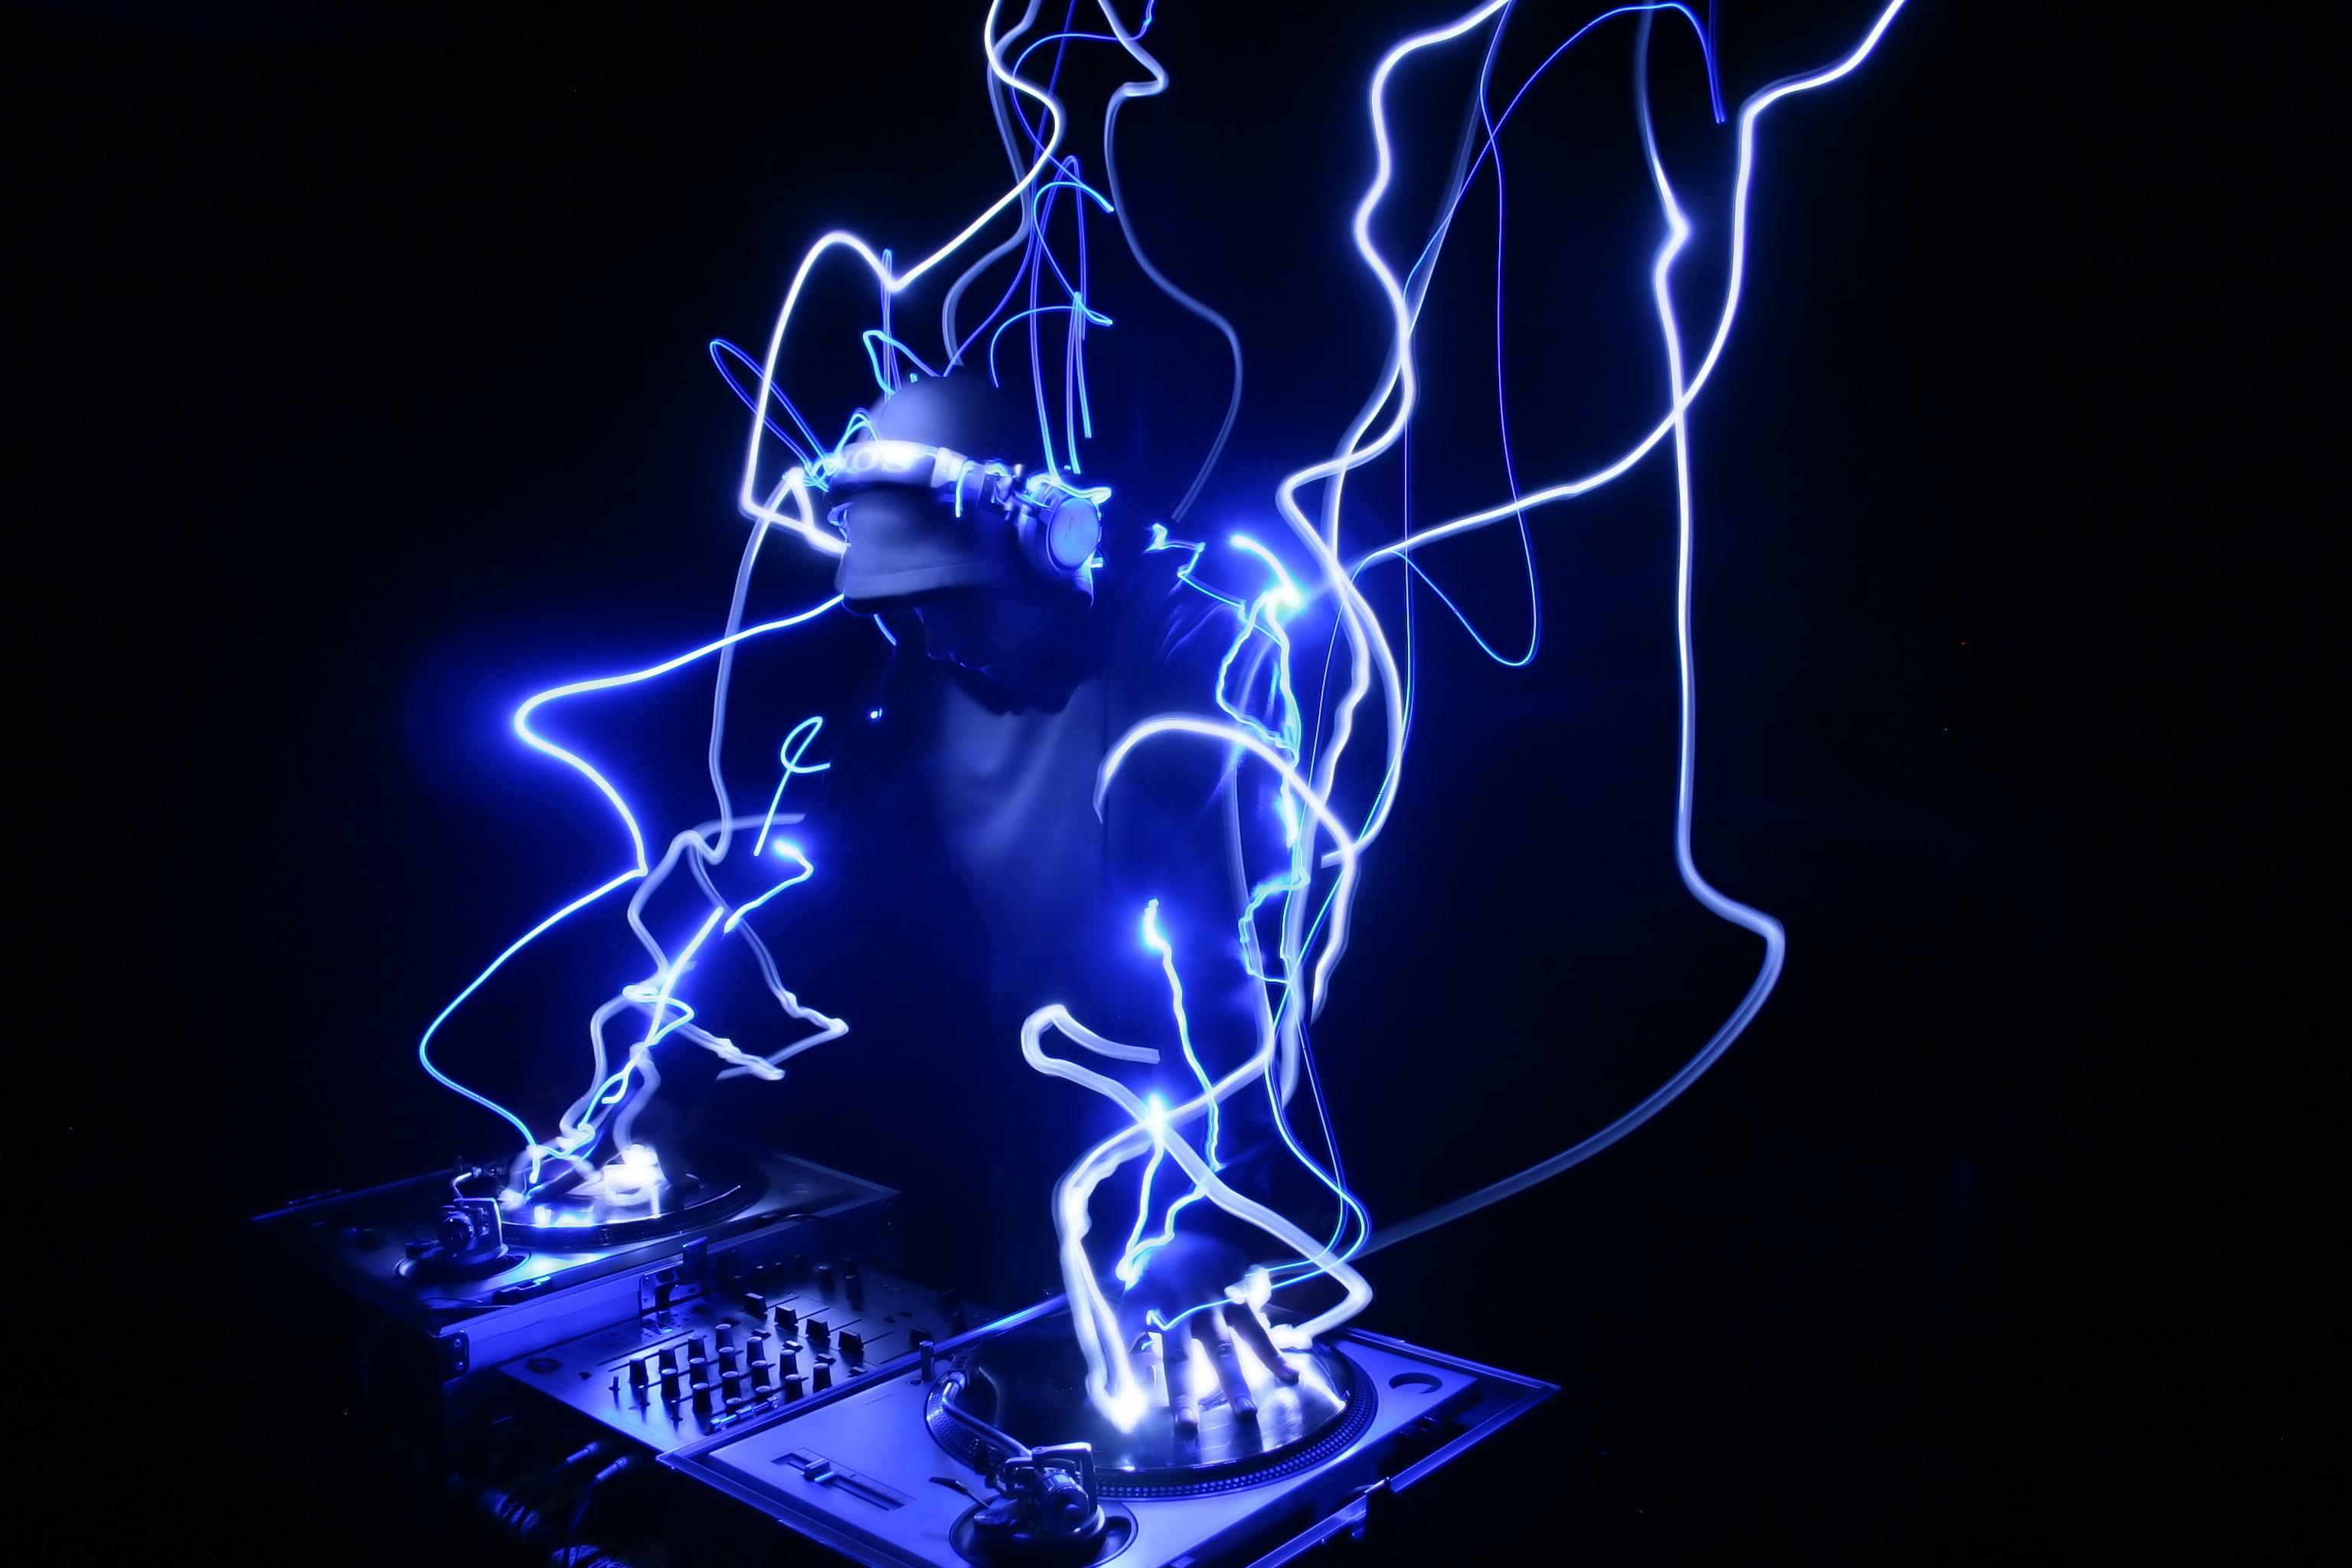 DJ Tiesto Dark Xperience 3072x2048